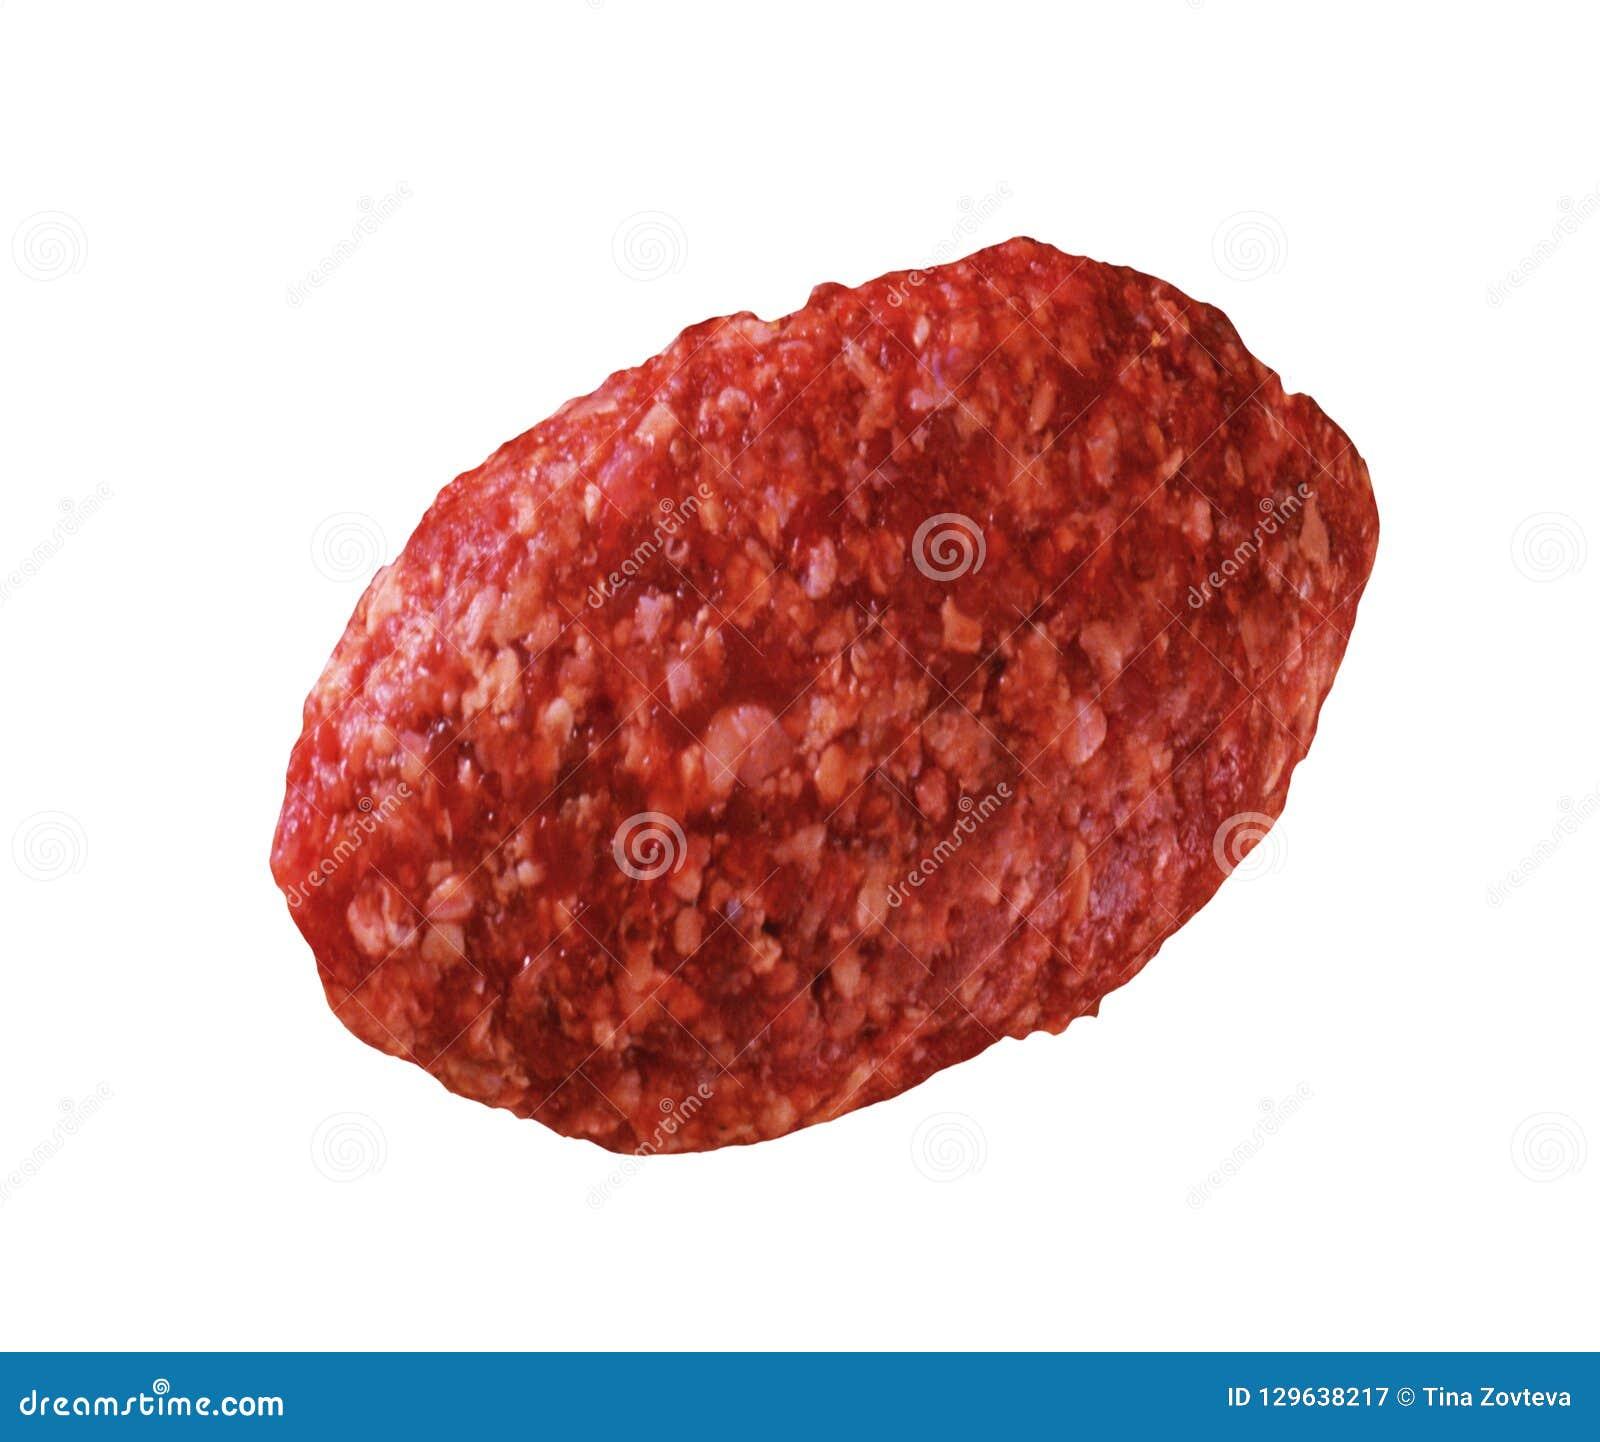 Raw meatball isolated